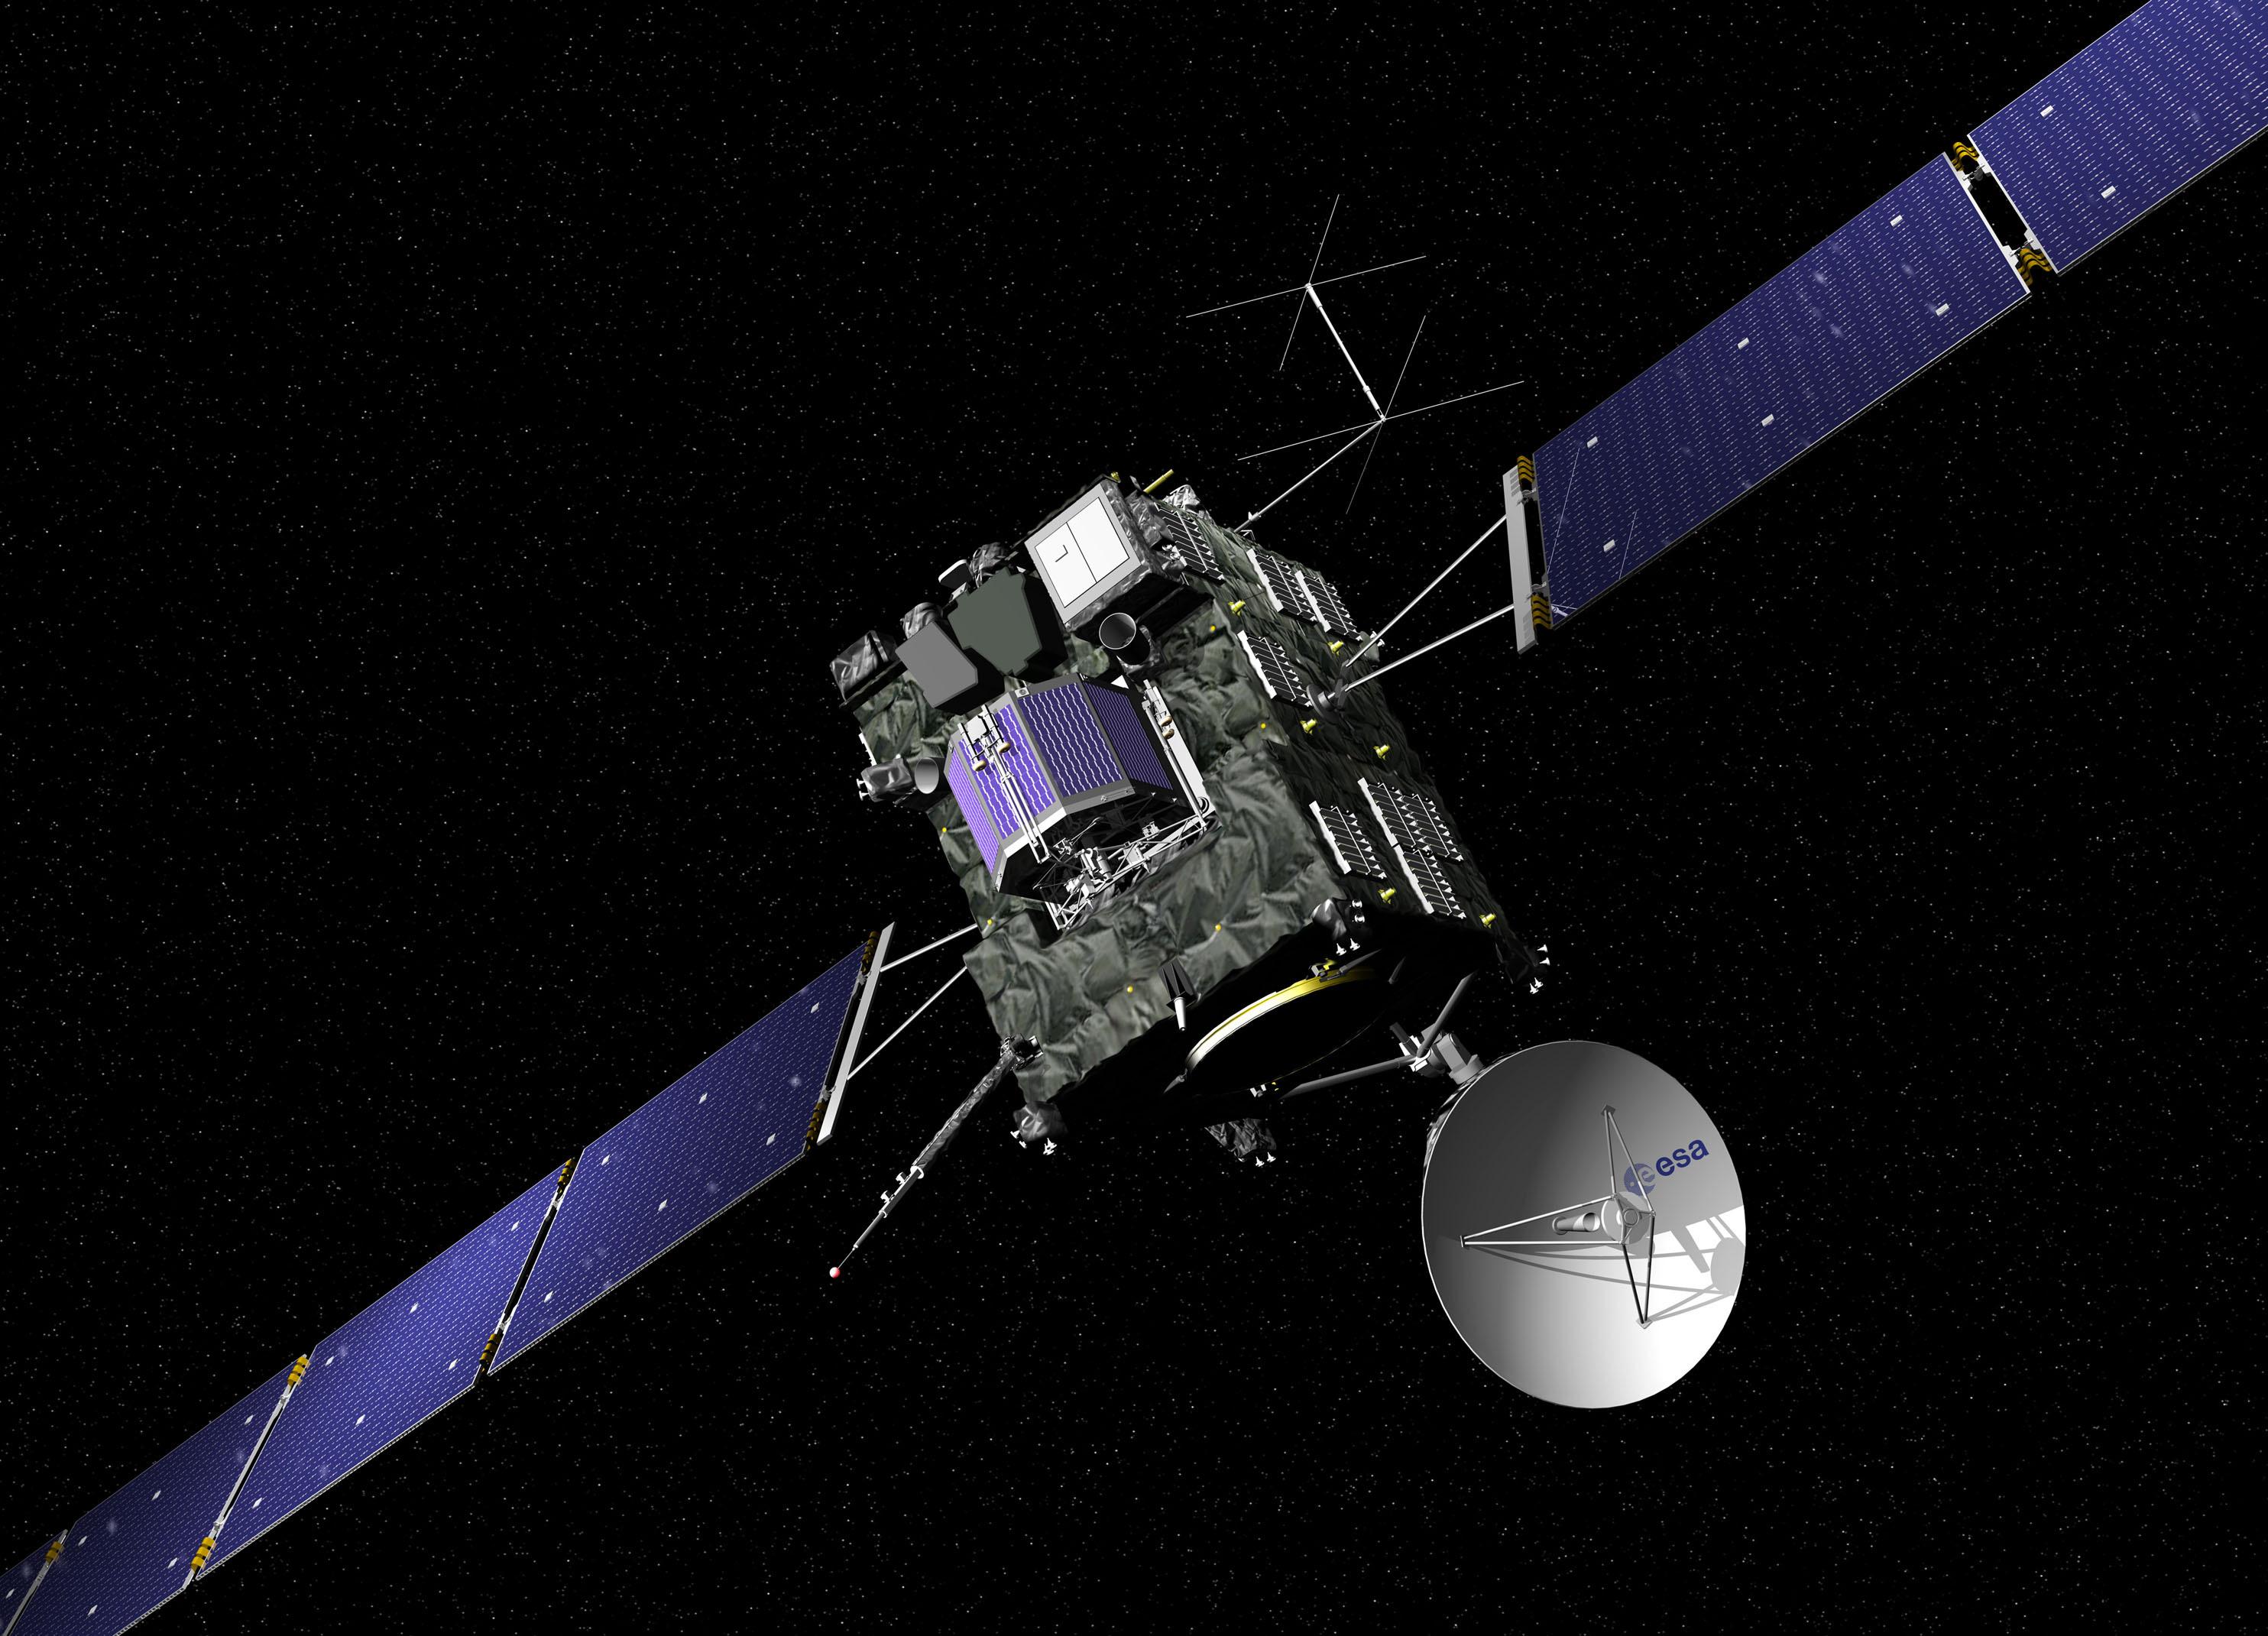 Rosetta Comet Spacecraft: Artist's View